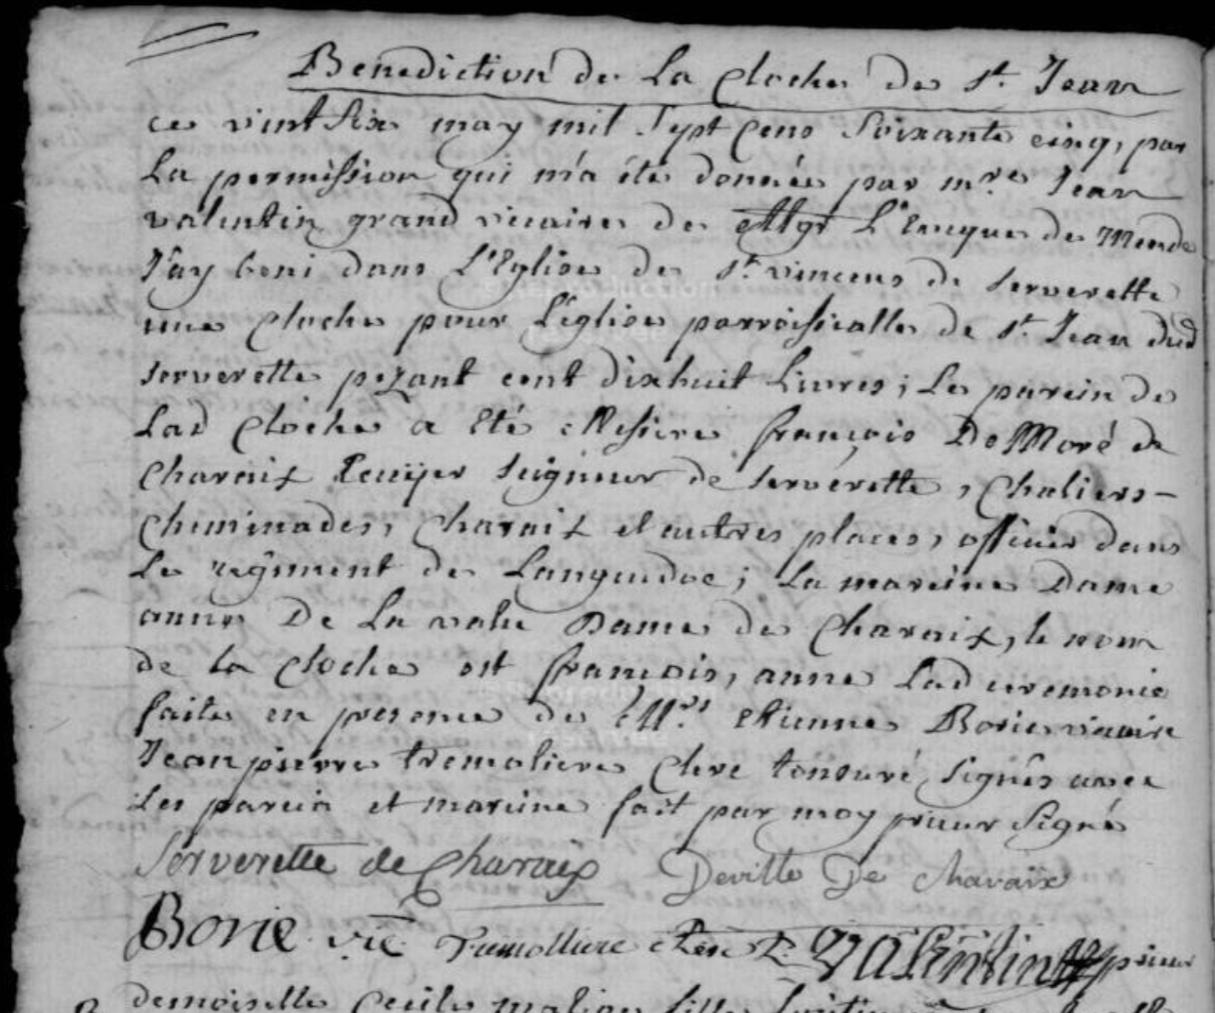 Généalogie Anecdotes Registre Serverette 1765 Religion Cloches